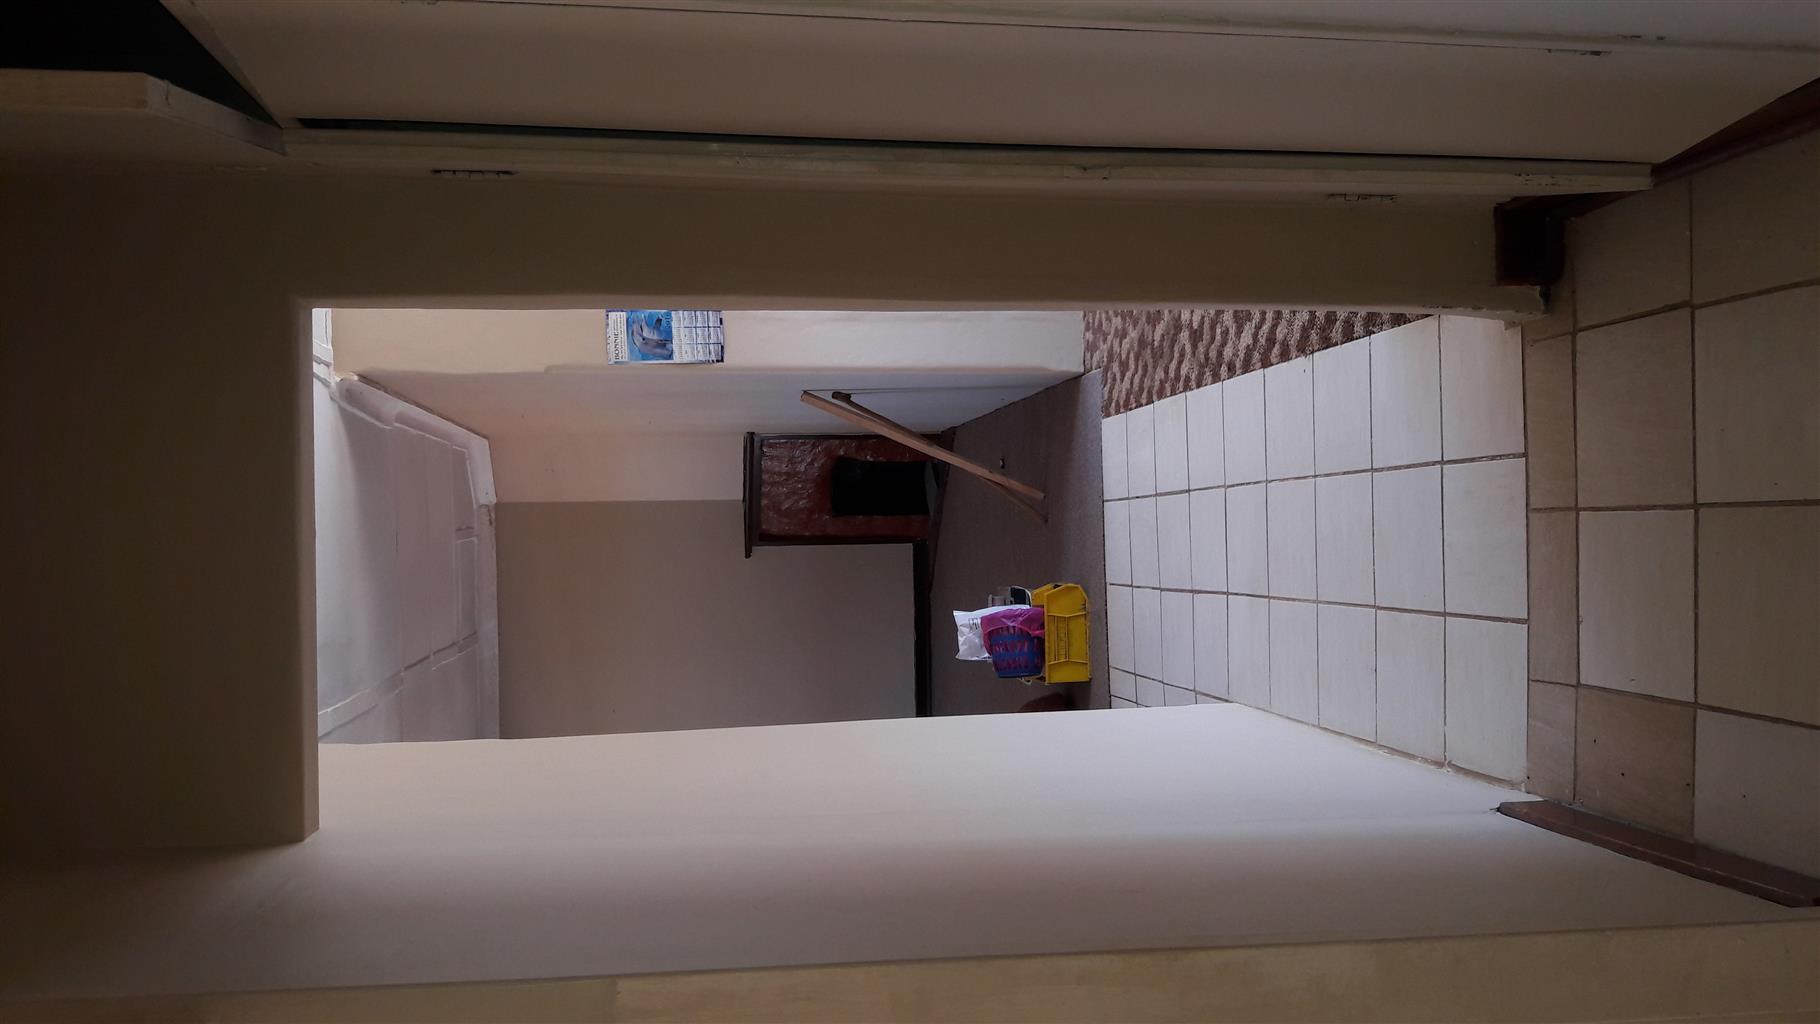 R265000 3 Bedroom 1.5 Bathroom 1 Garage 1 Outsite Room